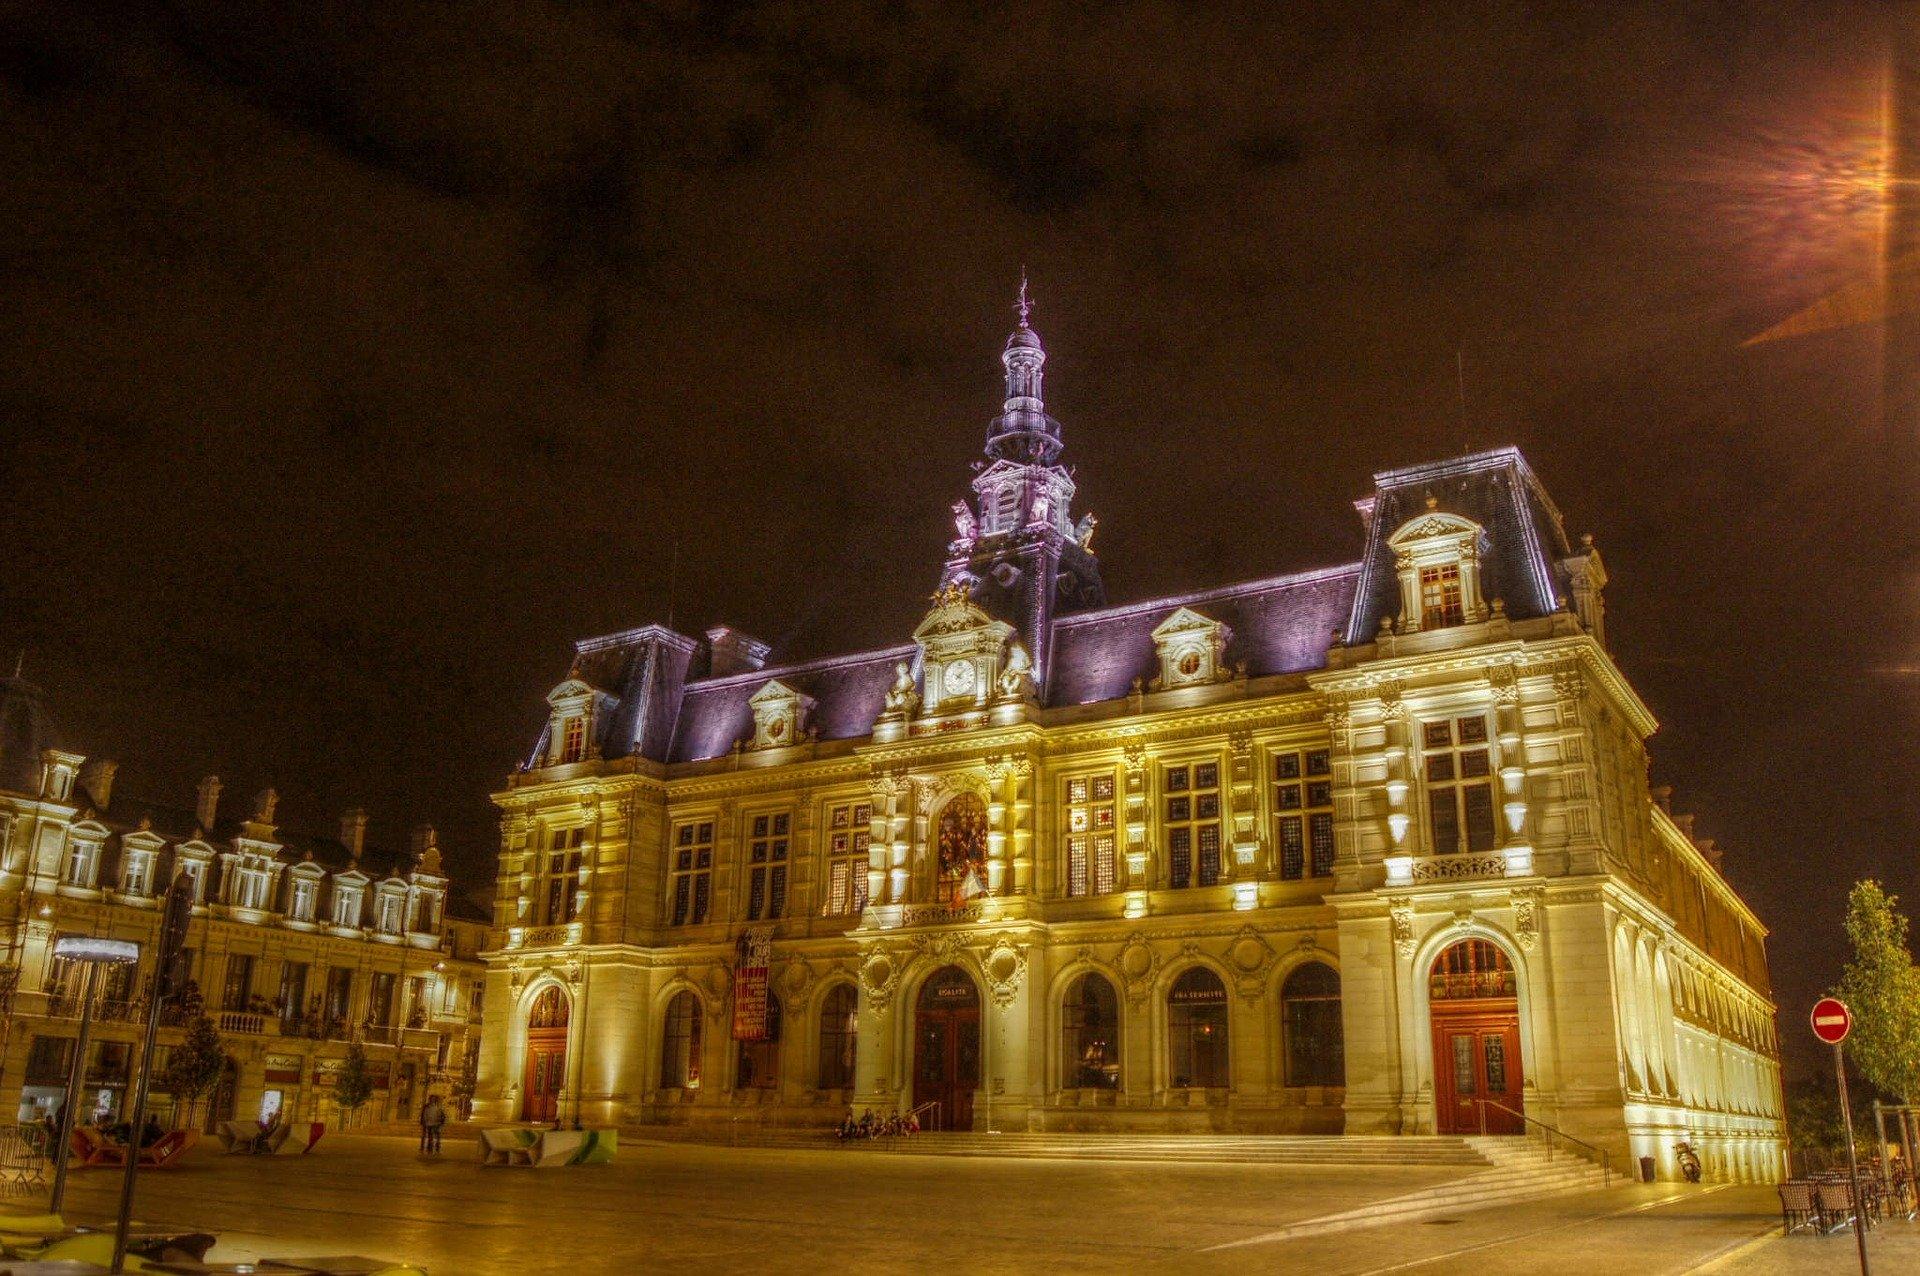 Hotel-restaurant-bistroquet-25km-de-poitiers